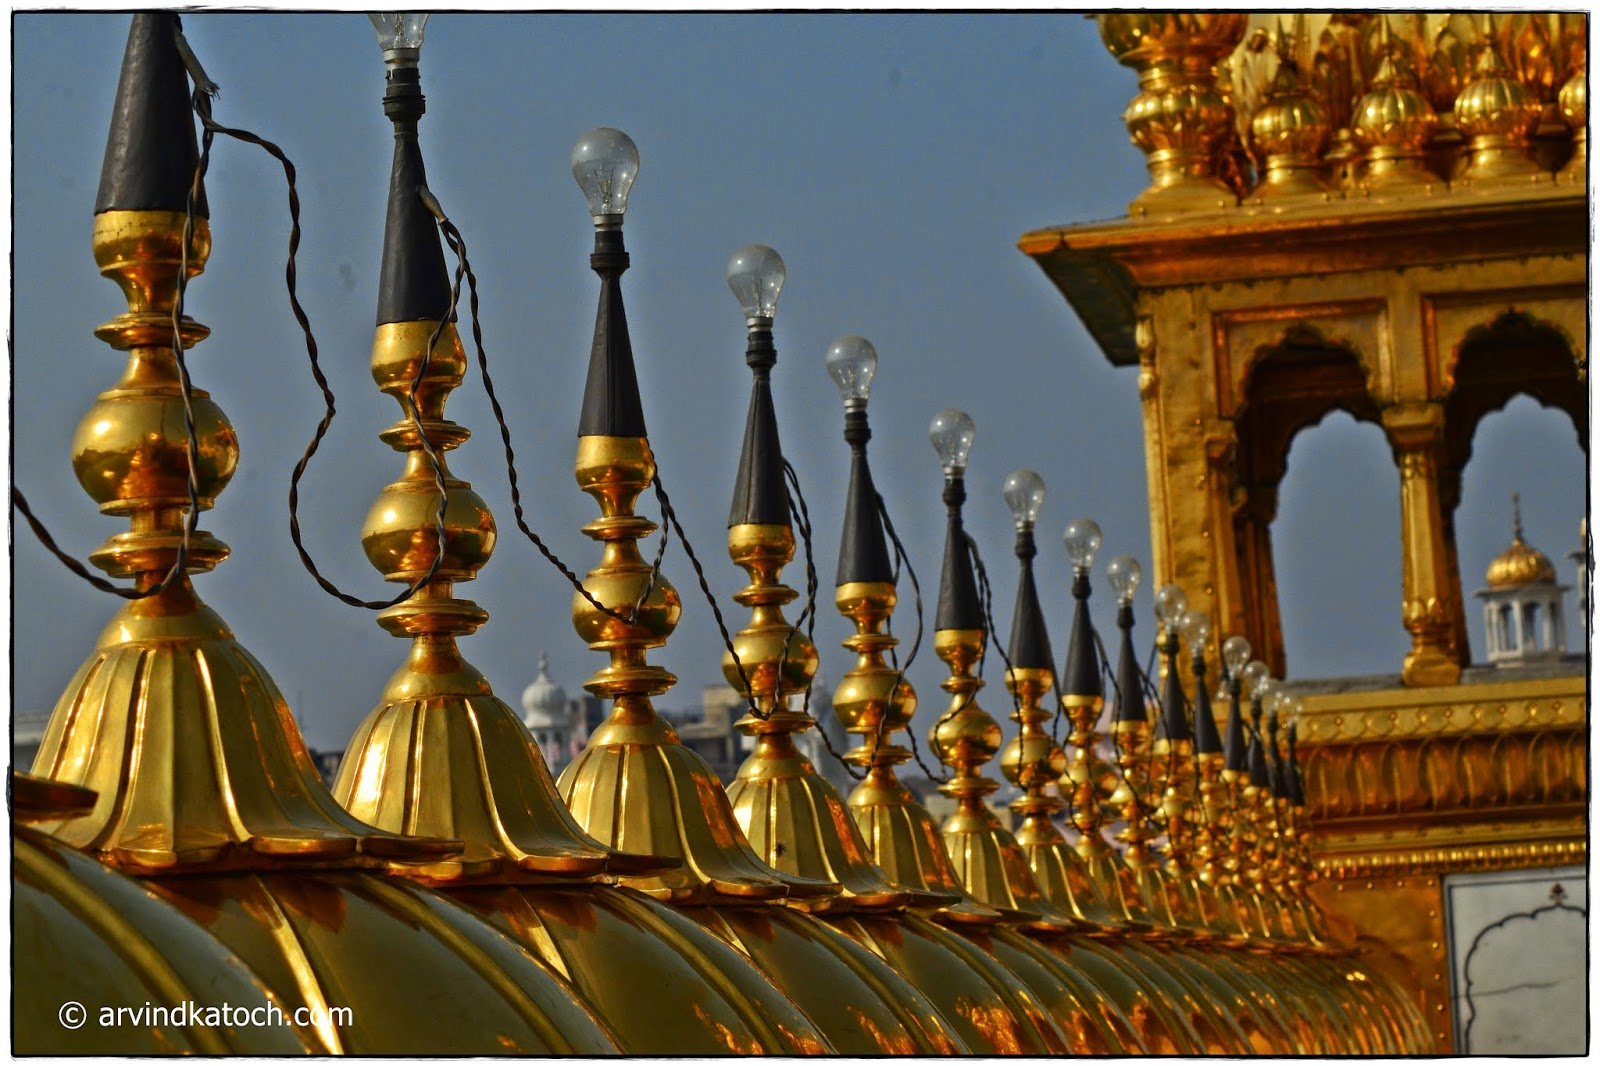 Light Bulbs, Golden temple, Amritsar,